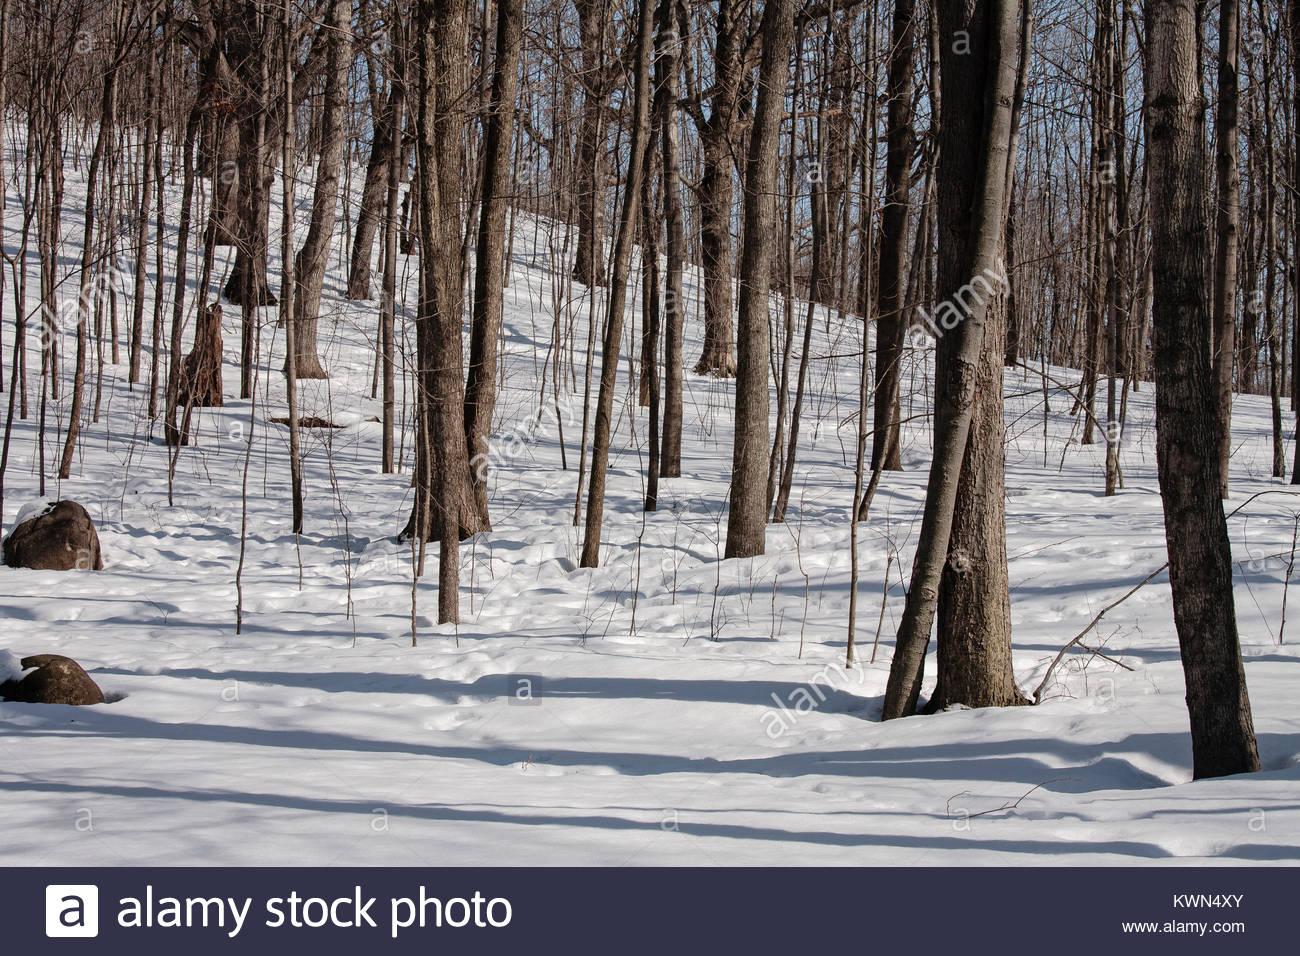 woods snow shadows stock photos  u0026 woods snow shadows stock images